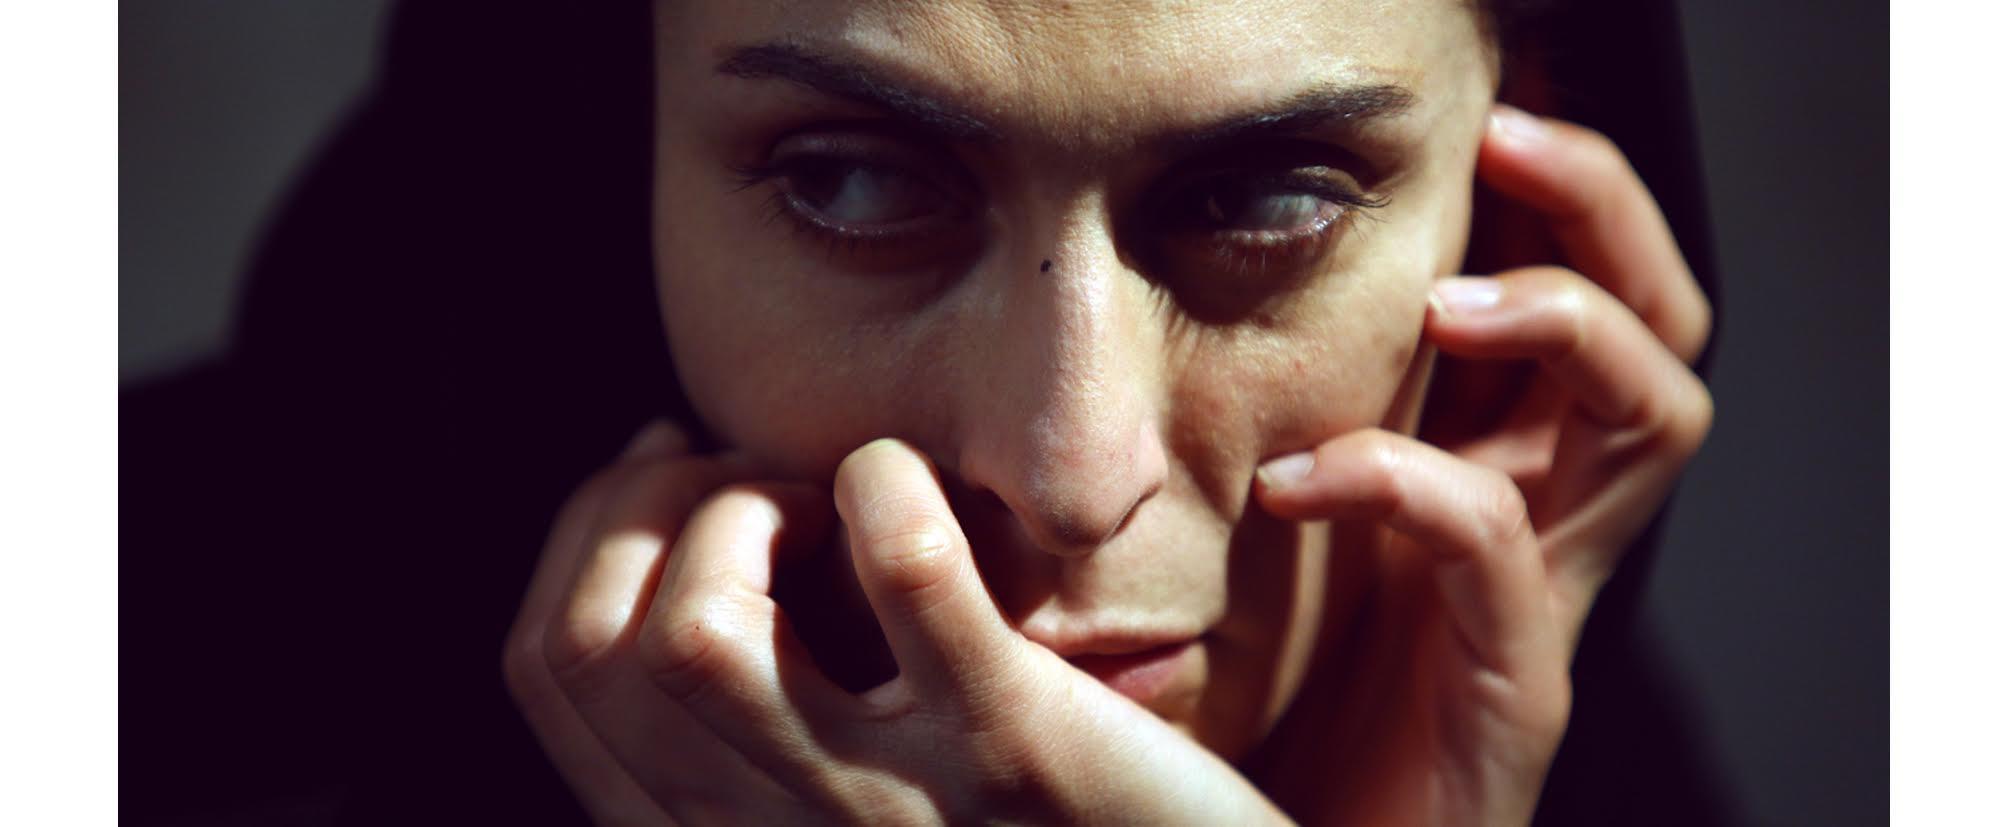 Yalda (JBA Production) by Massoud Bakhshi is one of the projects of MIA|Cinema Co-Production Market & Pitching Forum